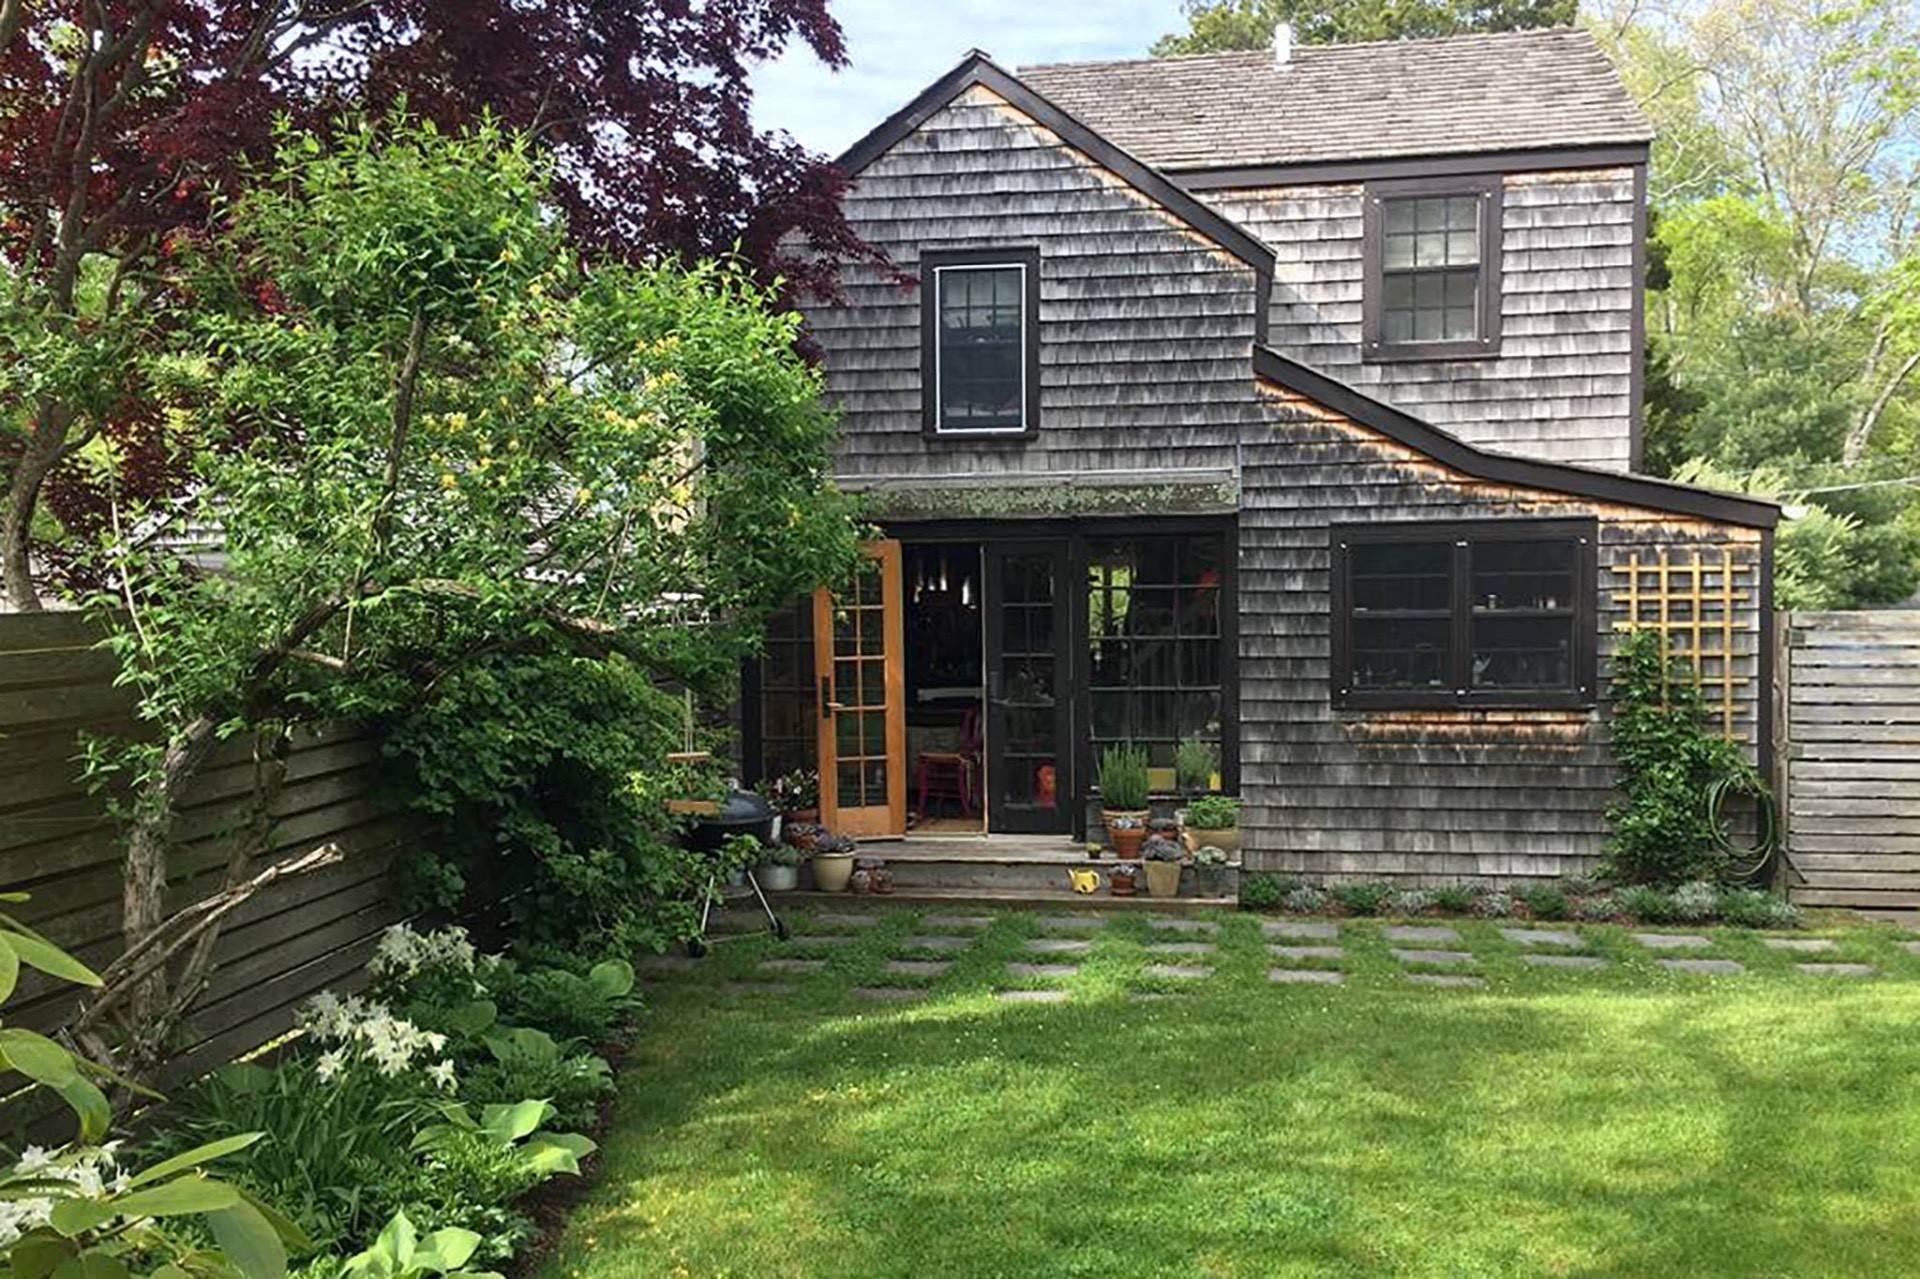 Single Family Homes at Sag Harbor Cottage 76 Hempstead Street, Sag Harbor, Southampton Town, NY 11963